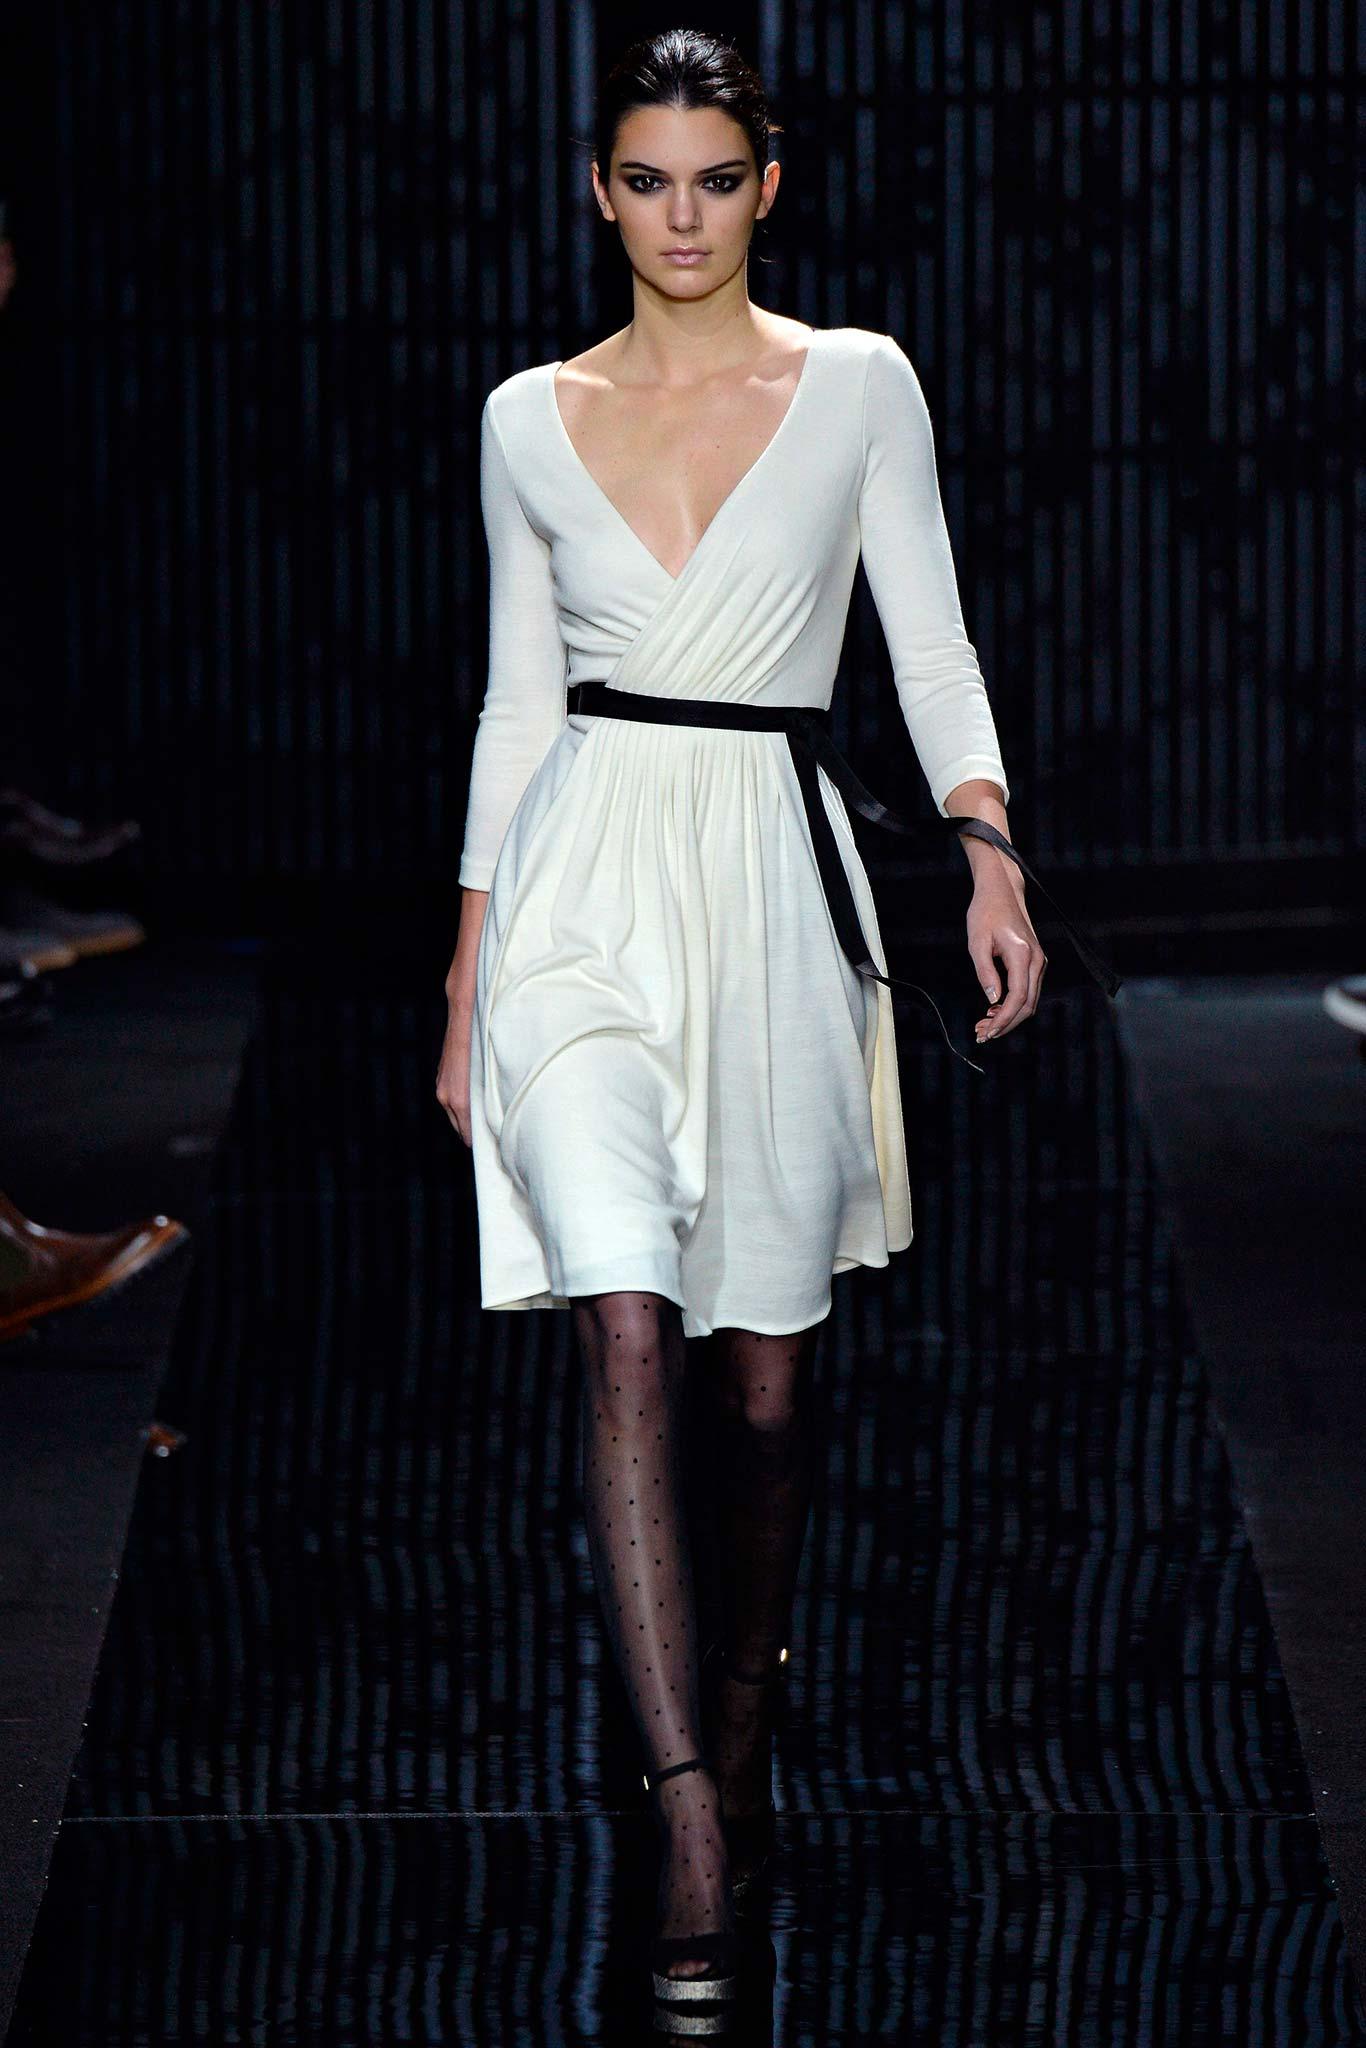 Diane von Furstenberg Fall 2015 Ready-to-Wear Look 1 Photo: Yannis Vlamos / Indigitalimages.com   Style.com   Fall 2015 RTW Runway Looks